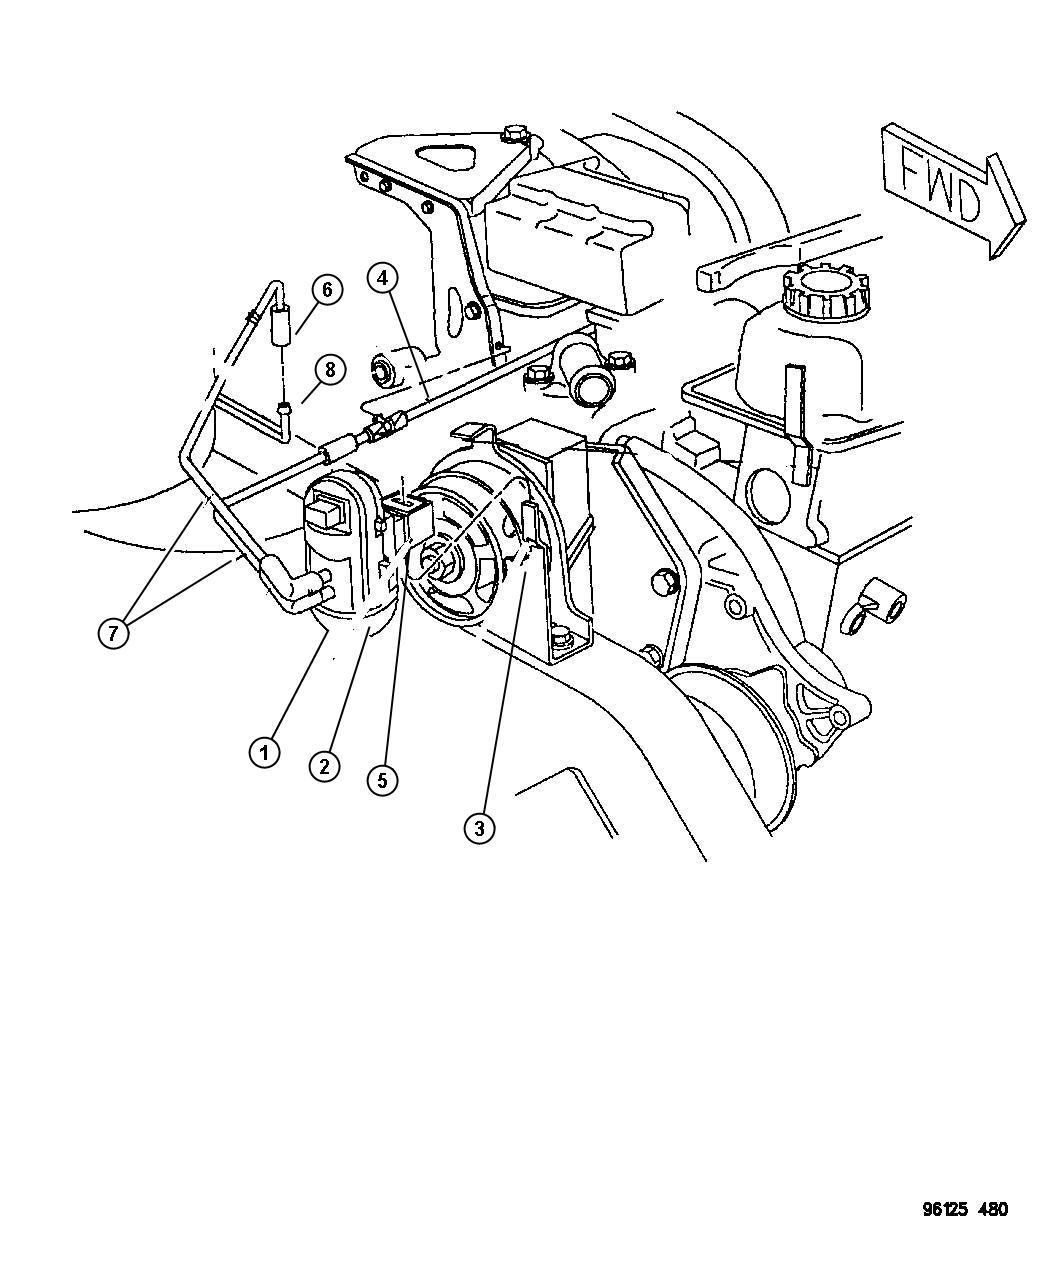 Audi A8 Starter Location